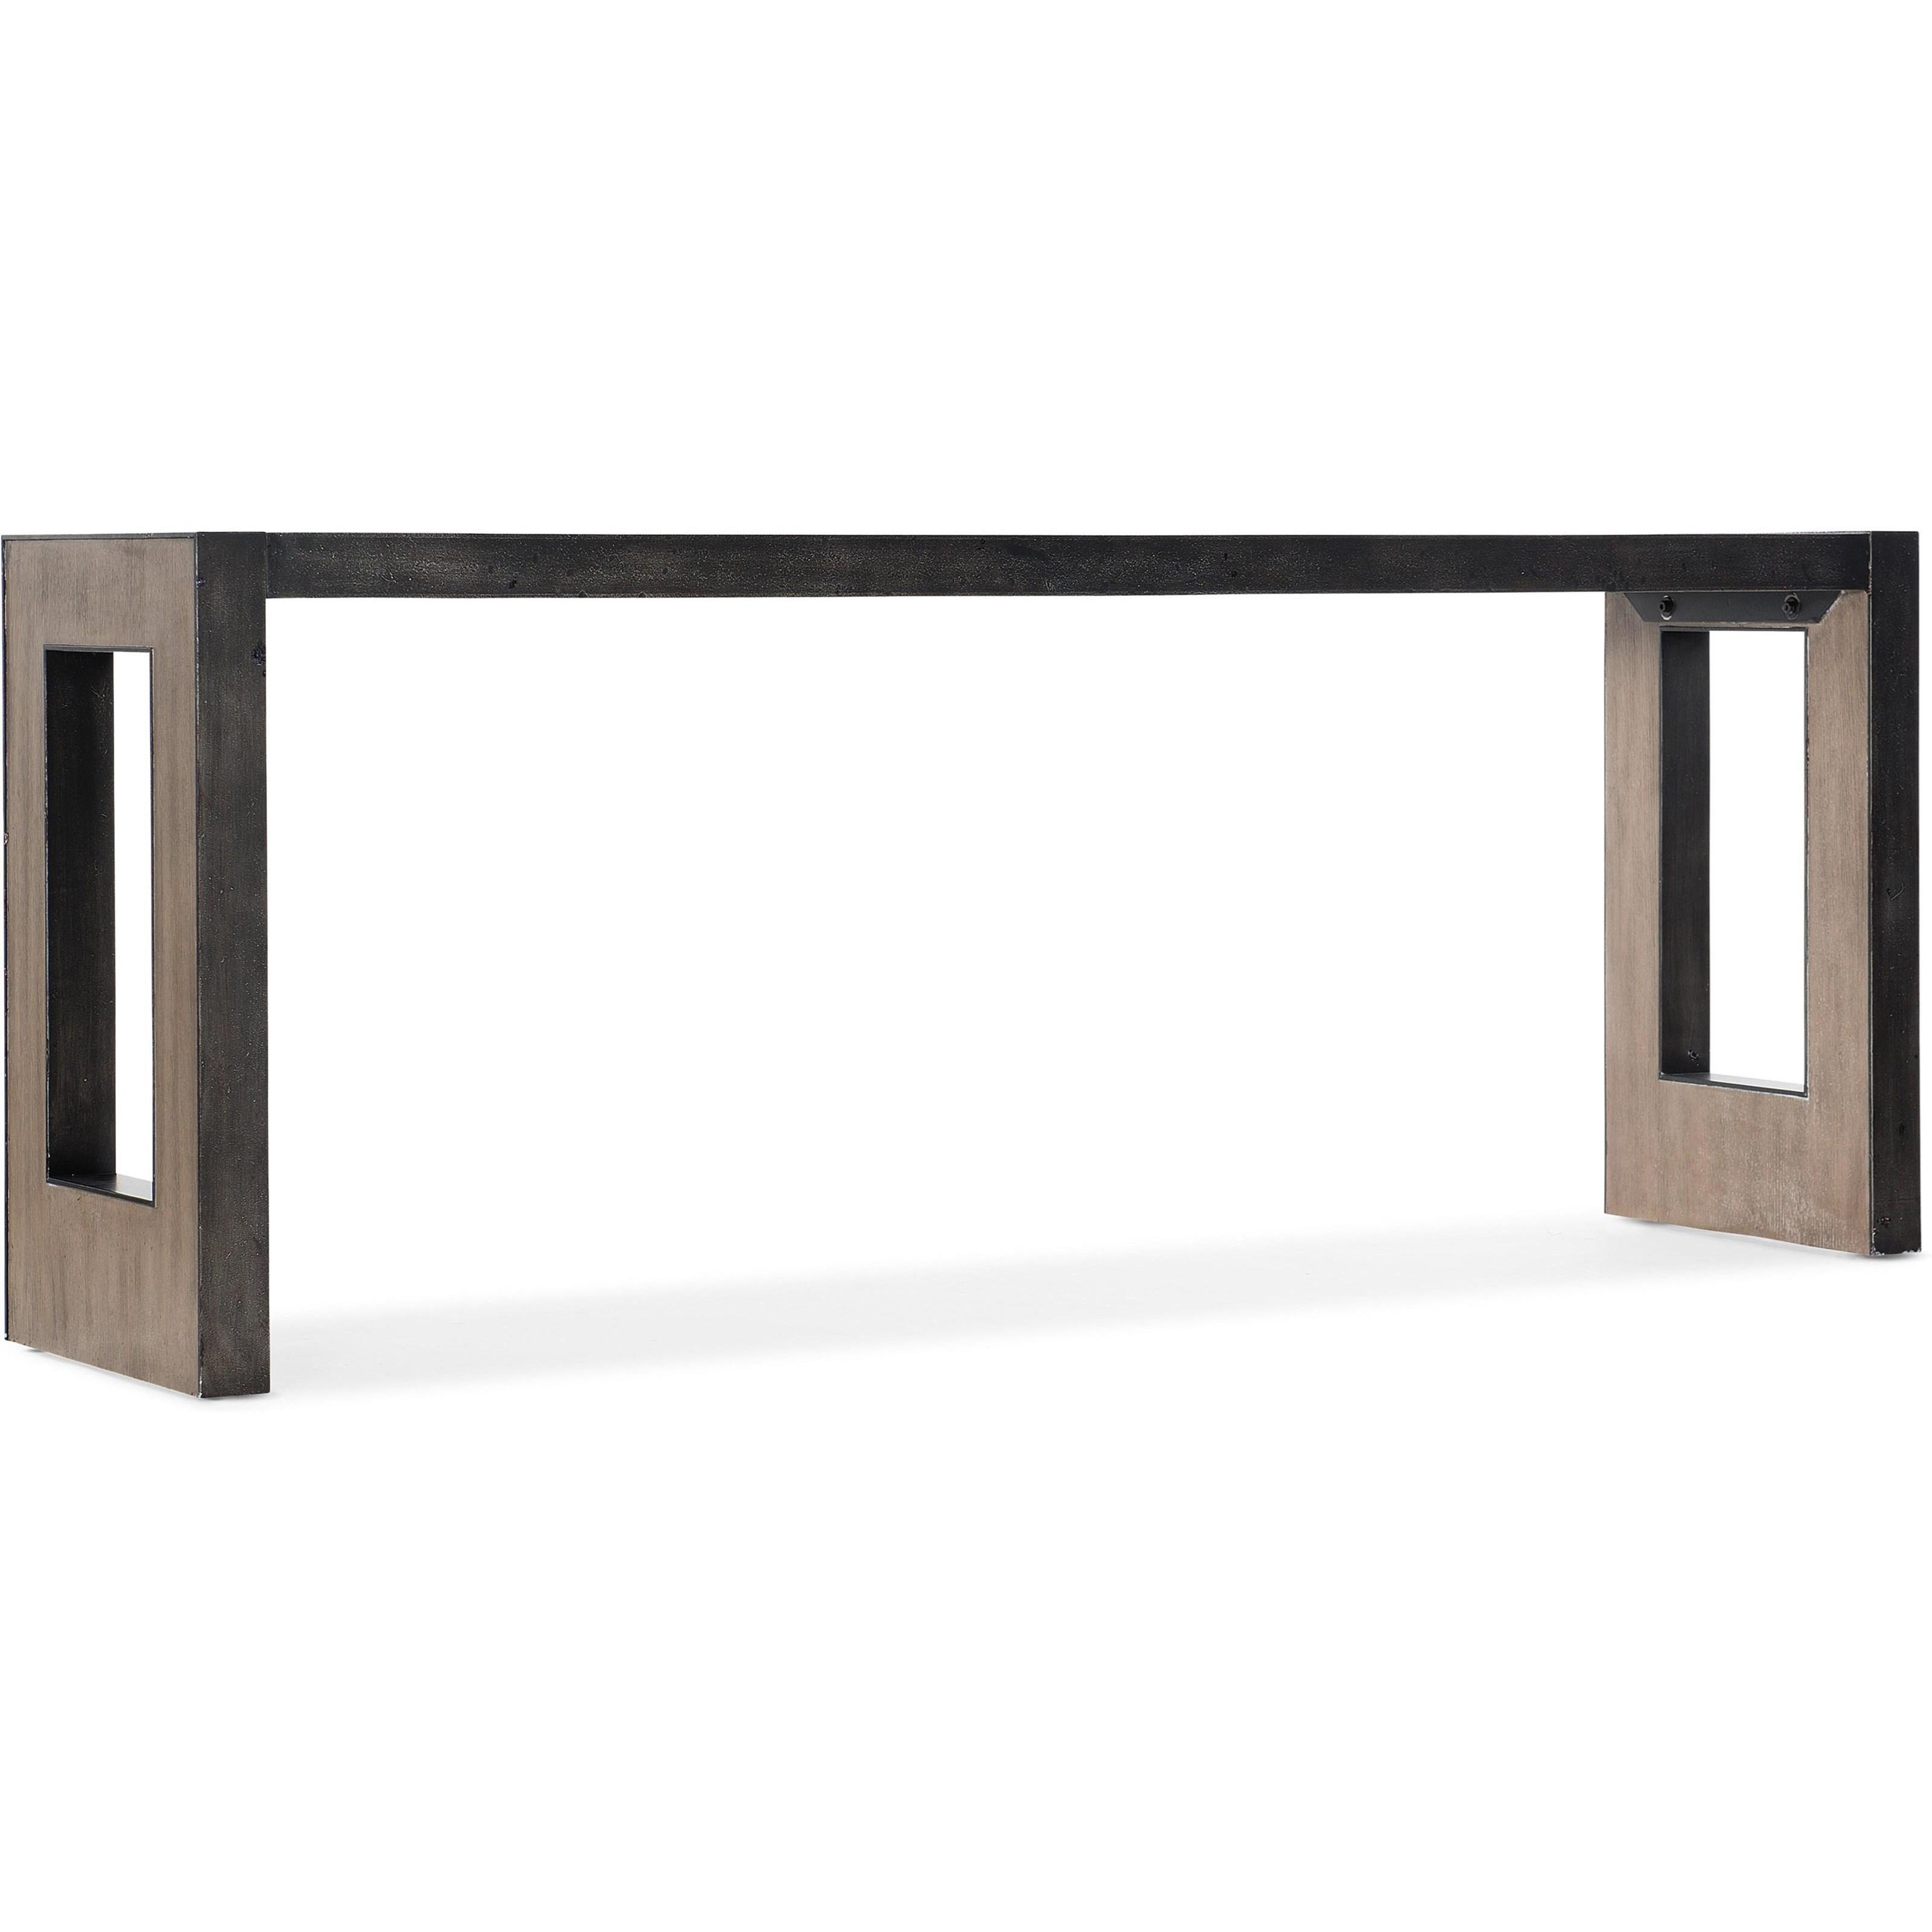 Melange Console by Hooker Furniture at Suburban Furniture